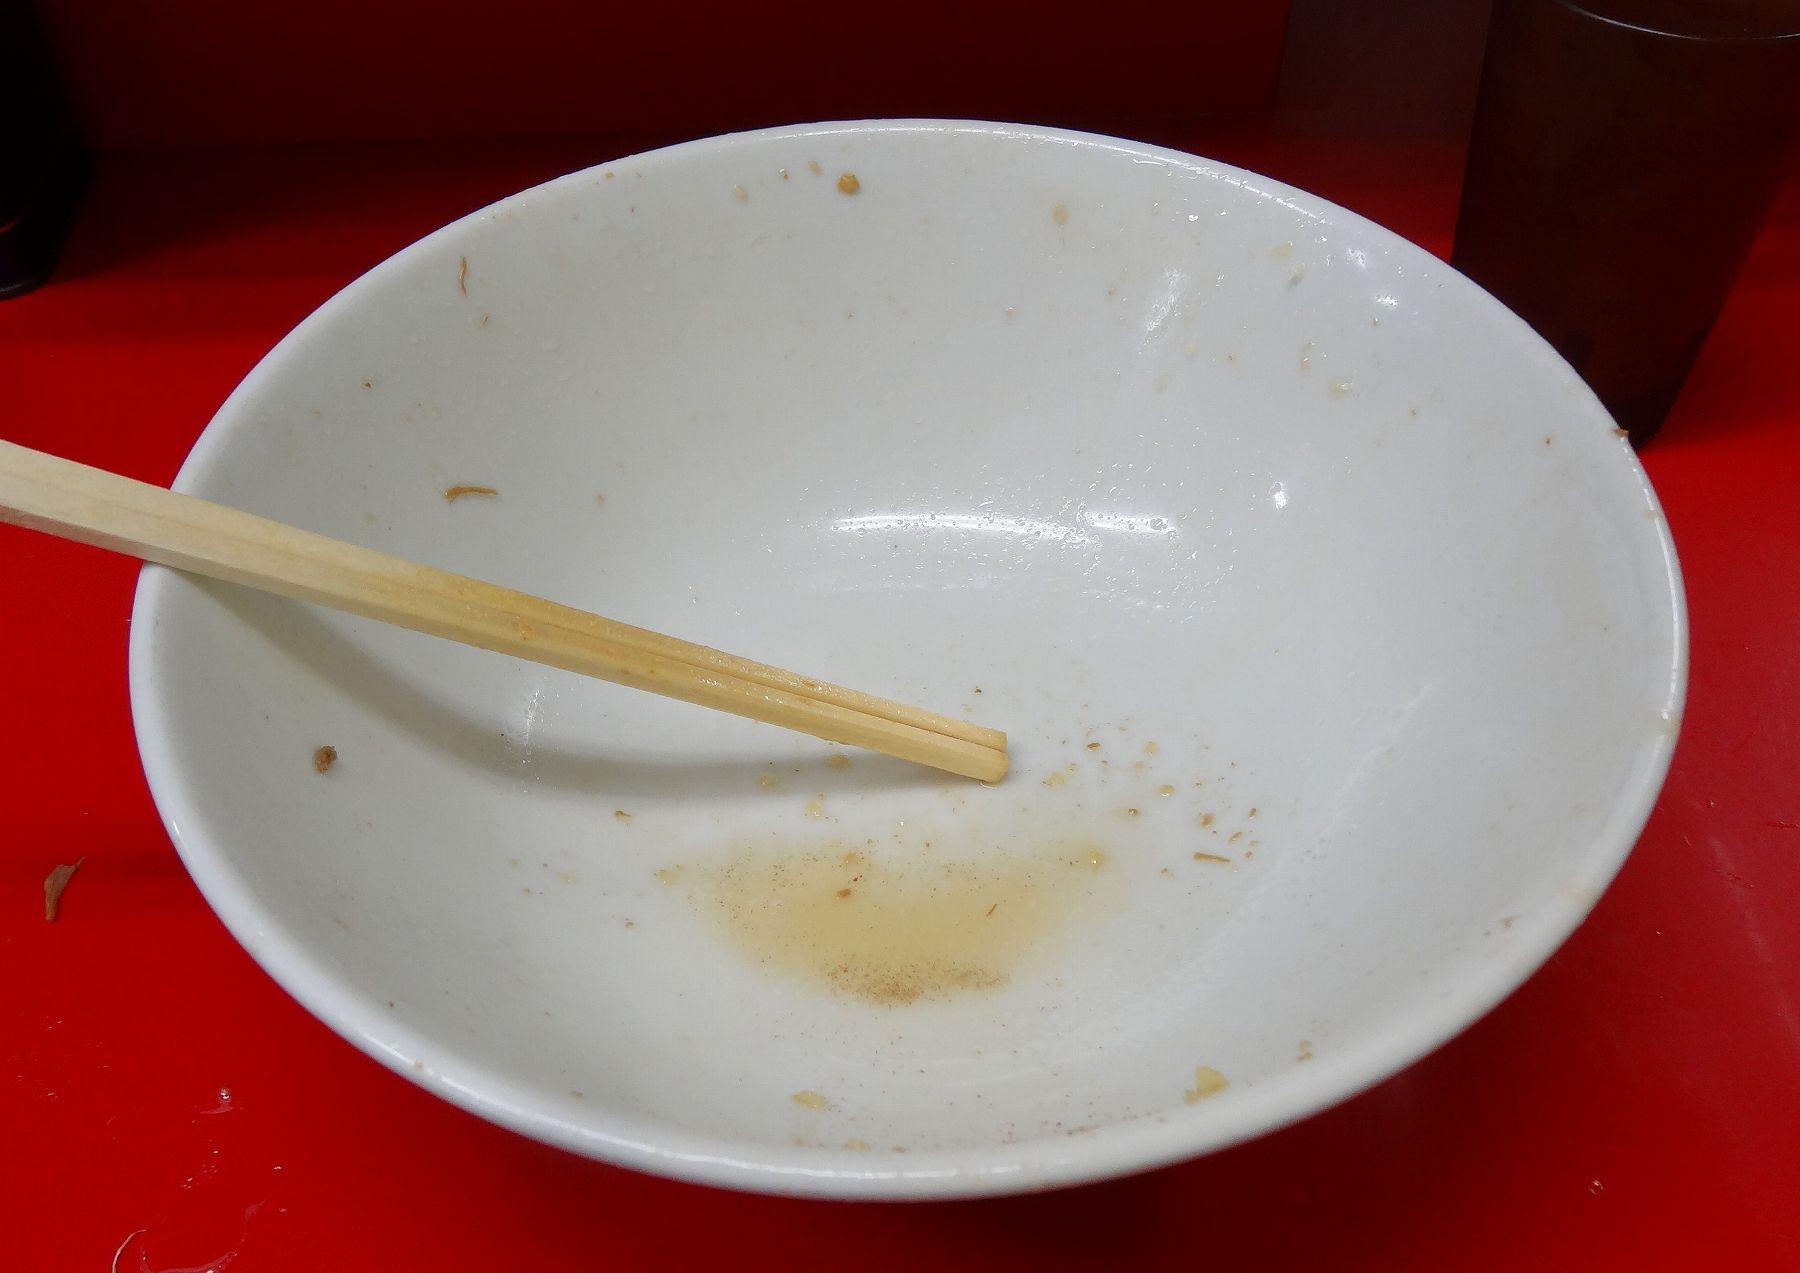 20121016006nakayama.jpg